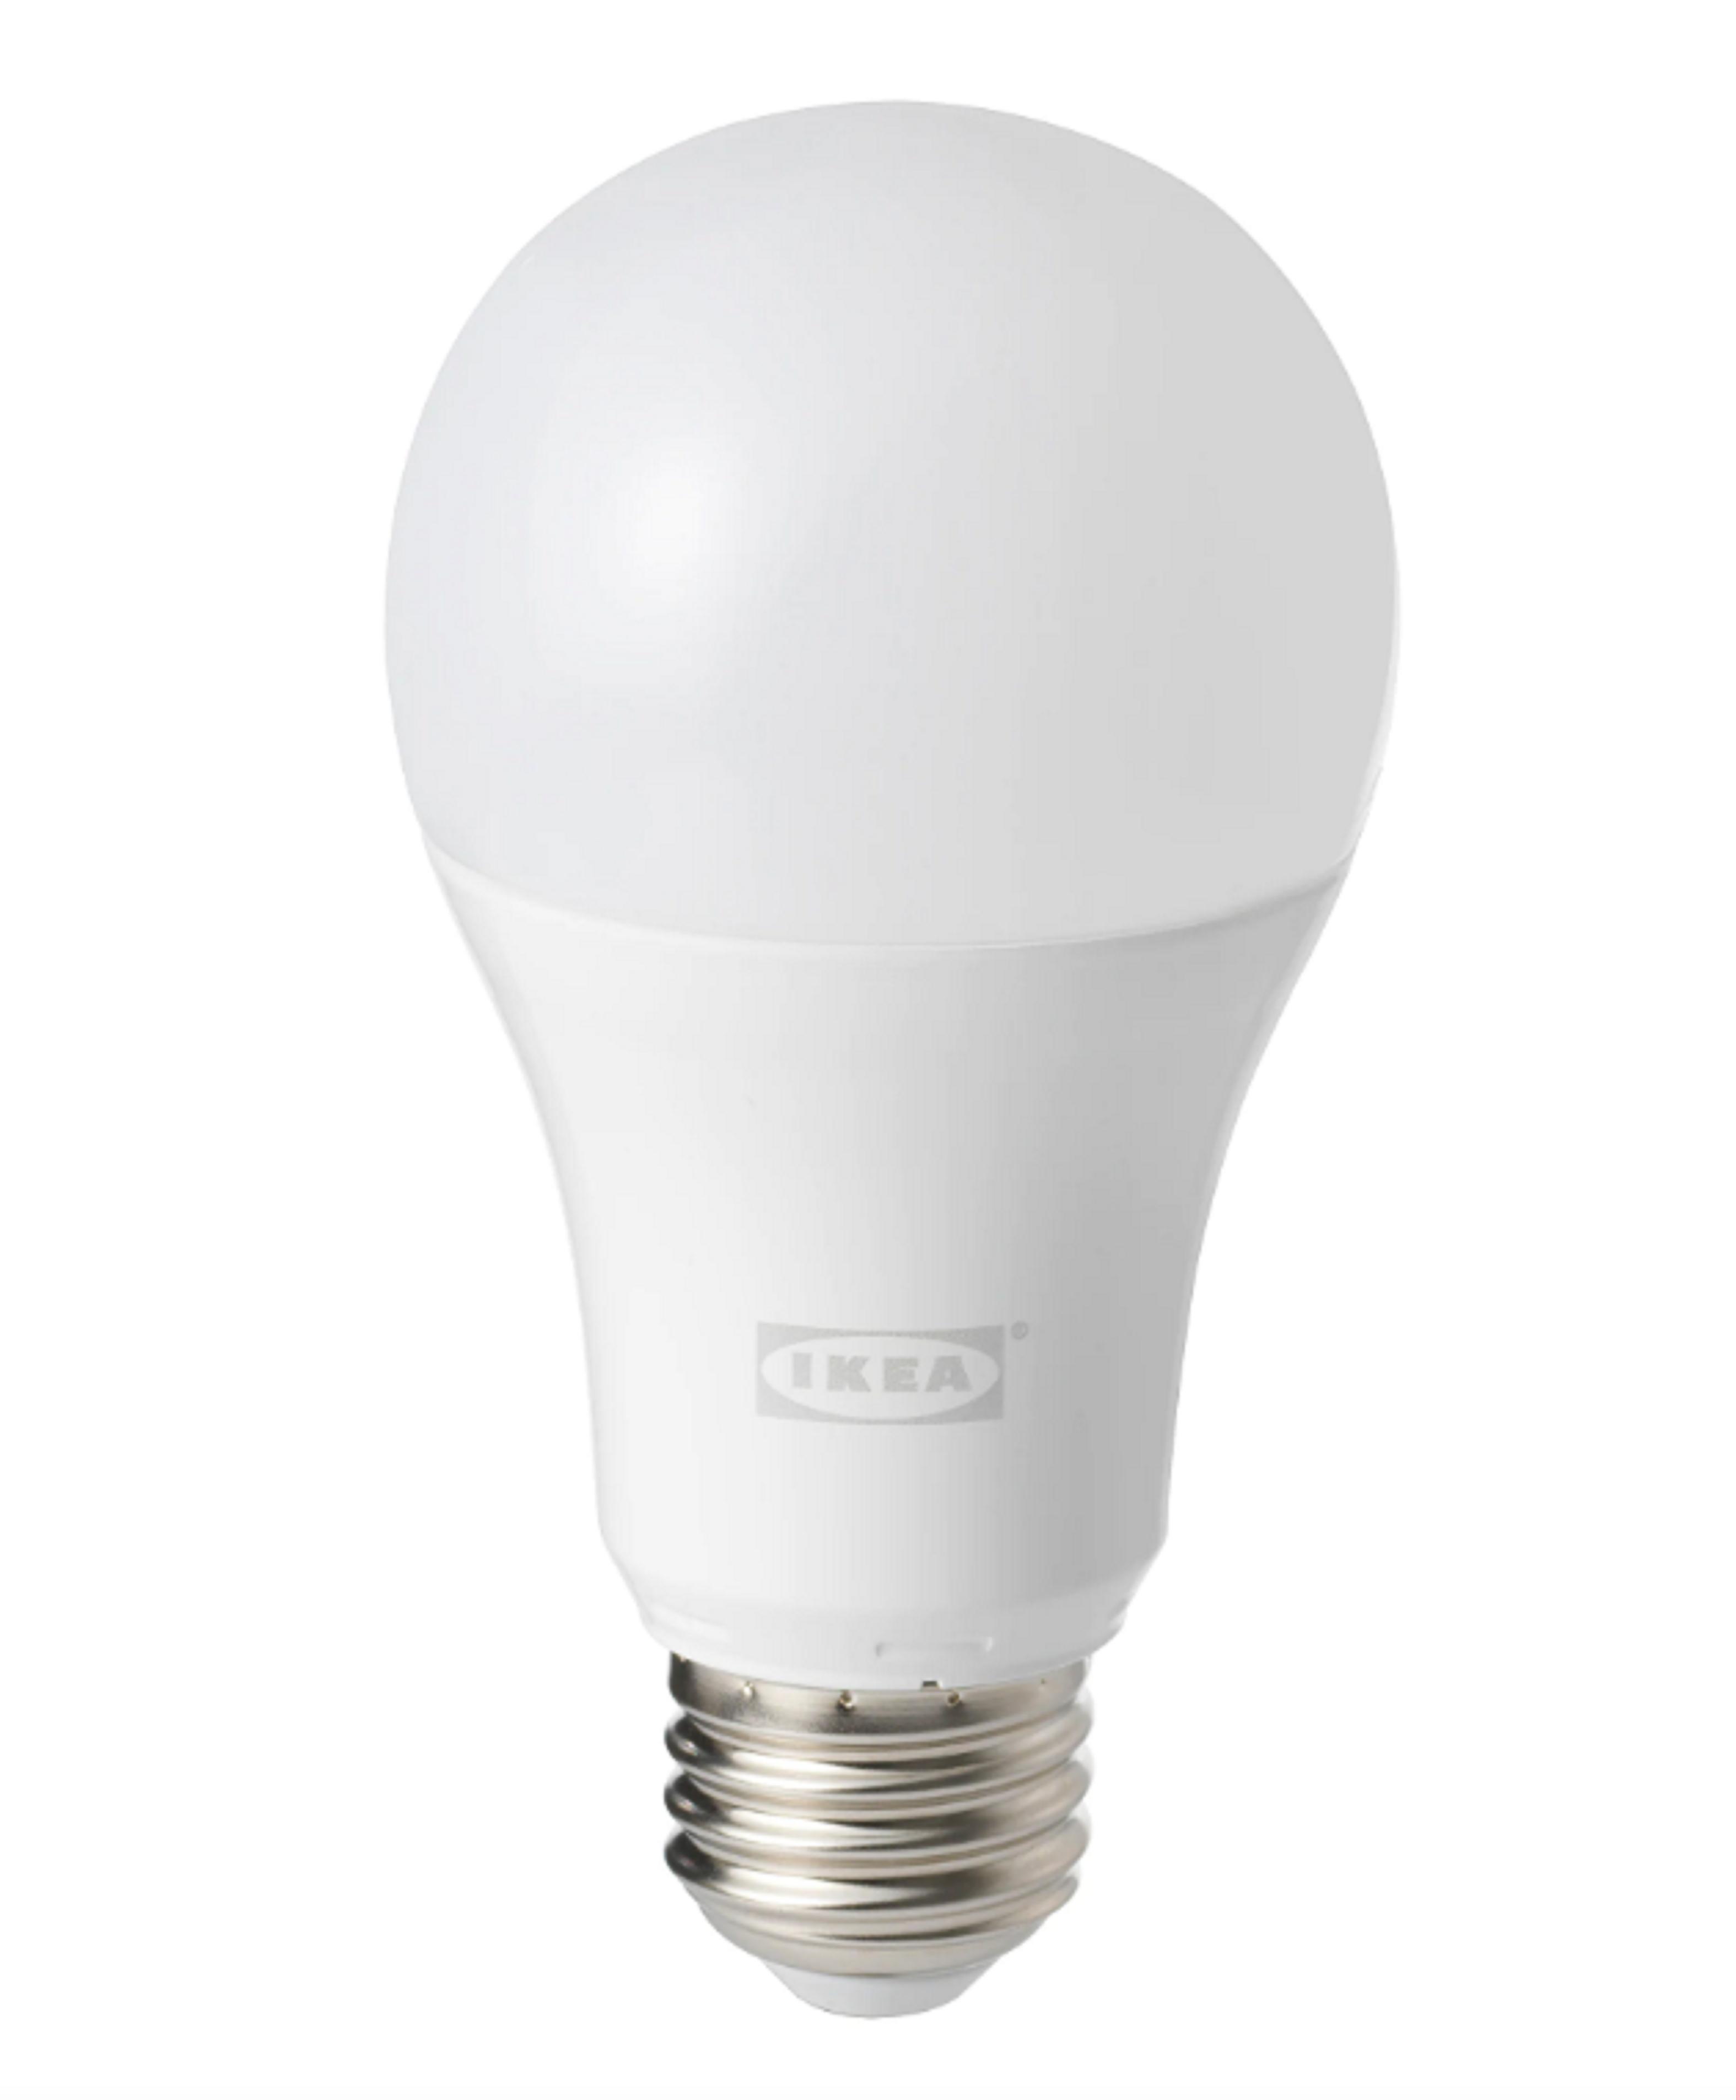 Ikea Ikea E27 Zigbee lamp wit spectrum Tradfri